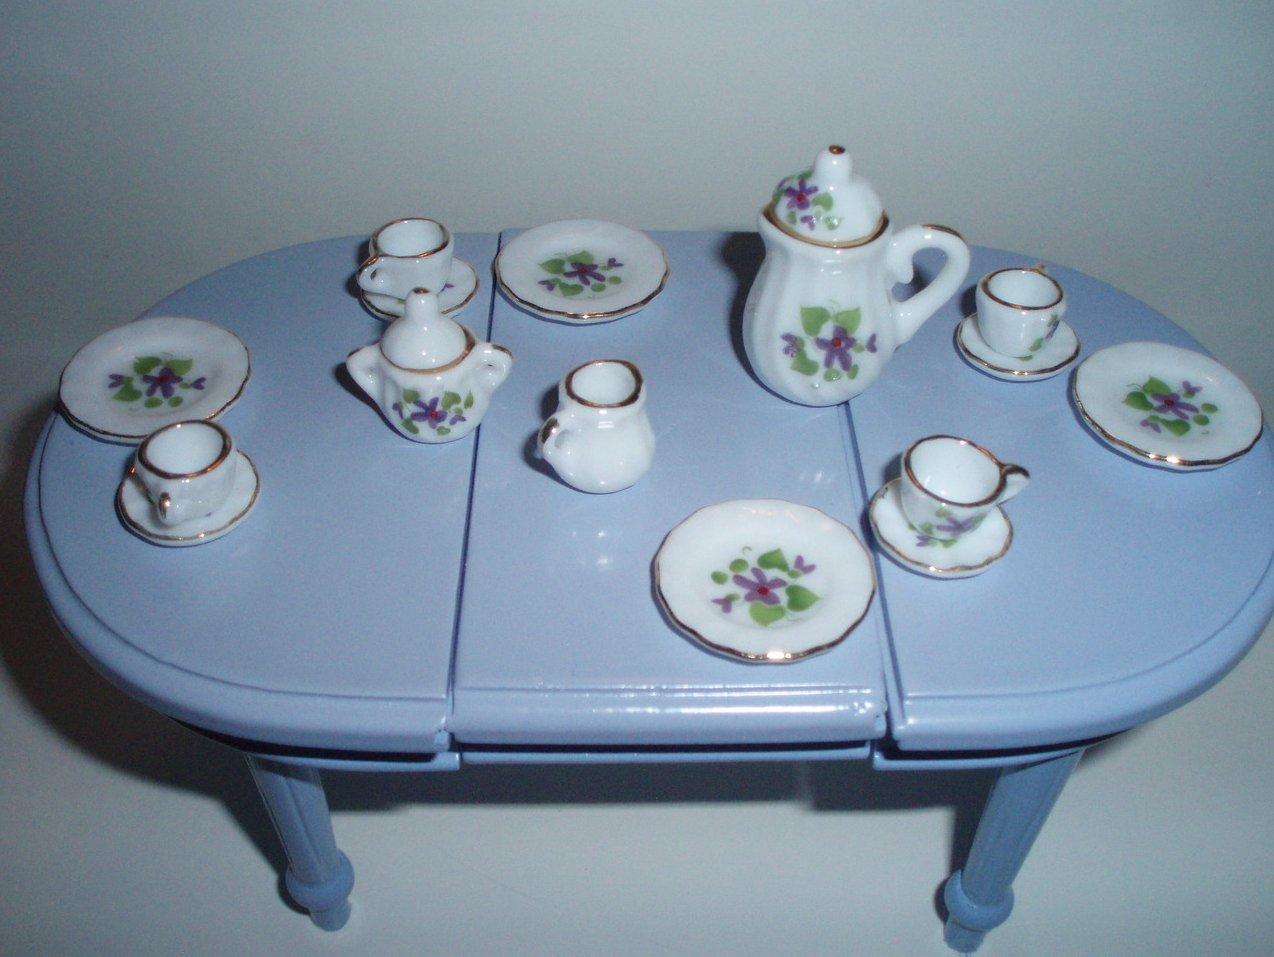 Dollhouse miniature China Ironstone Tea Luncheon set 17 Piece purple flowers